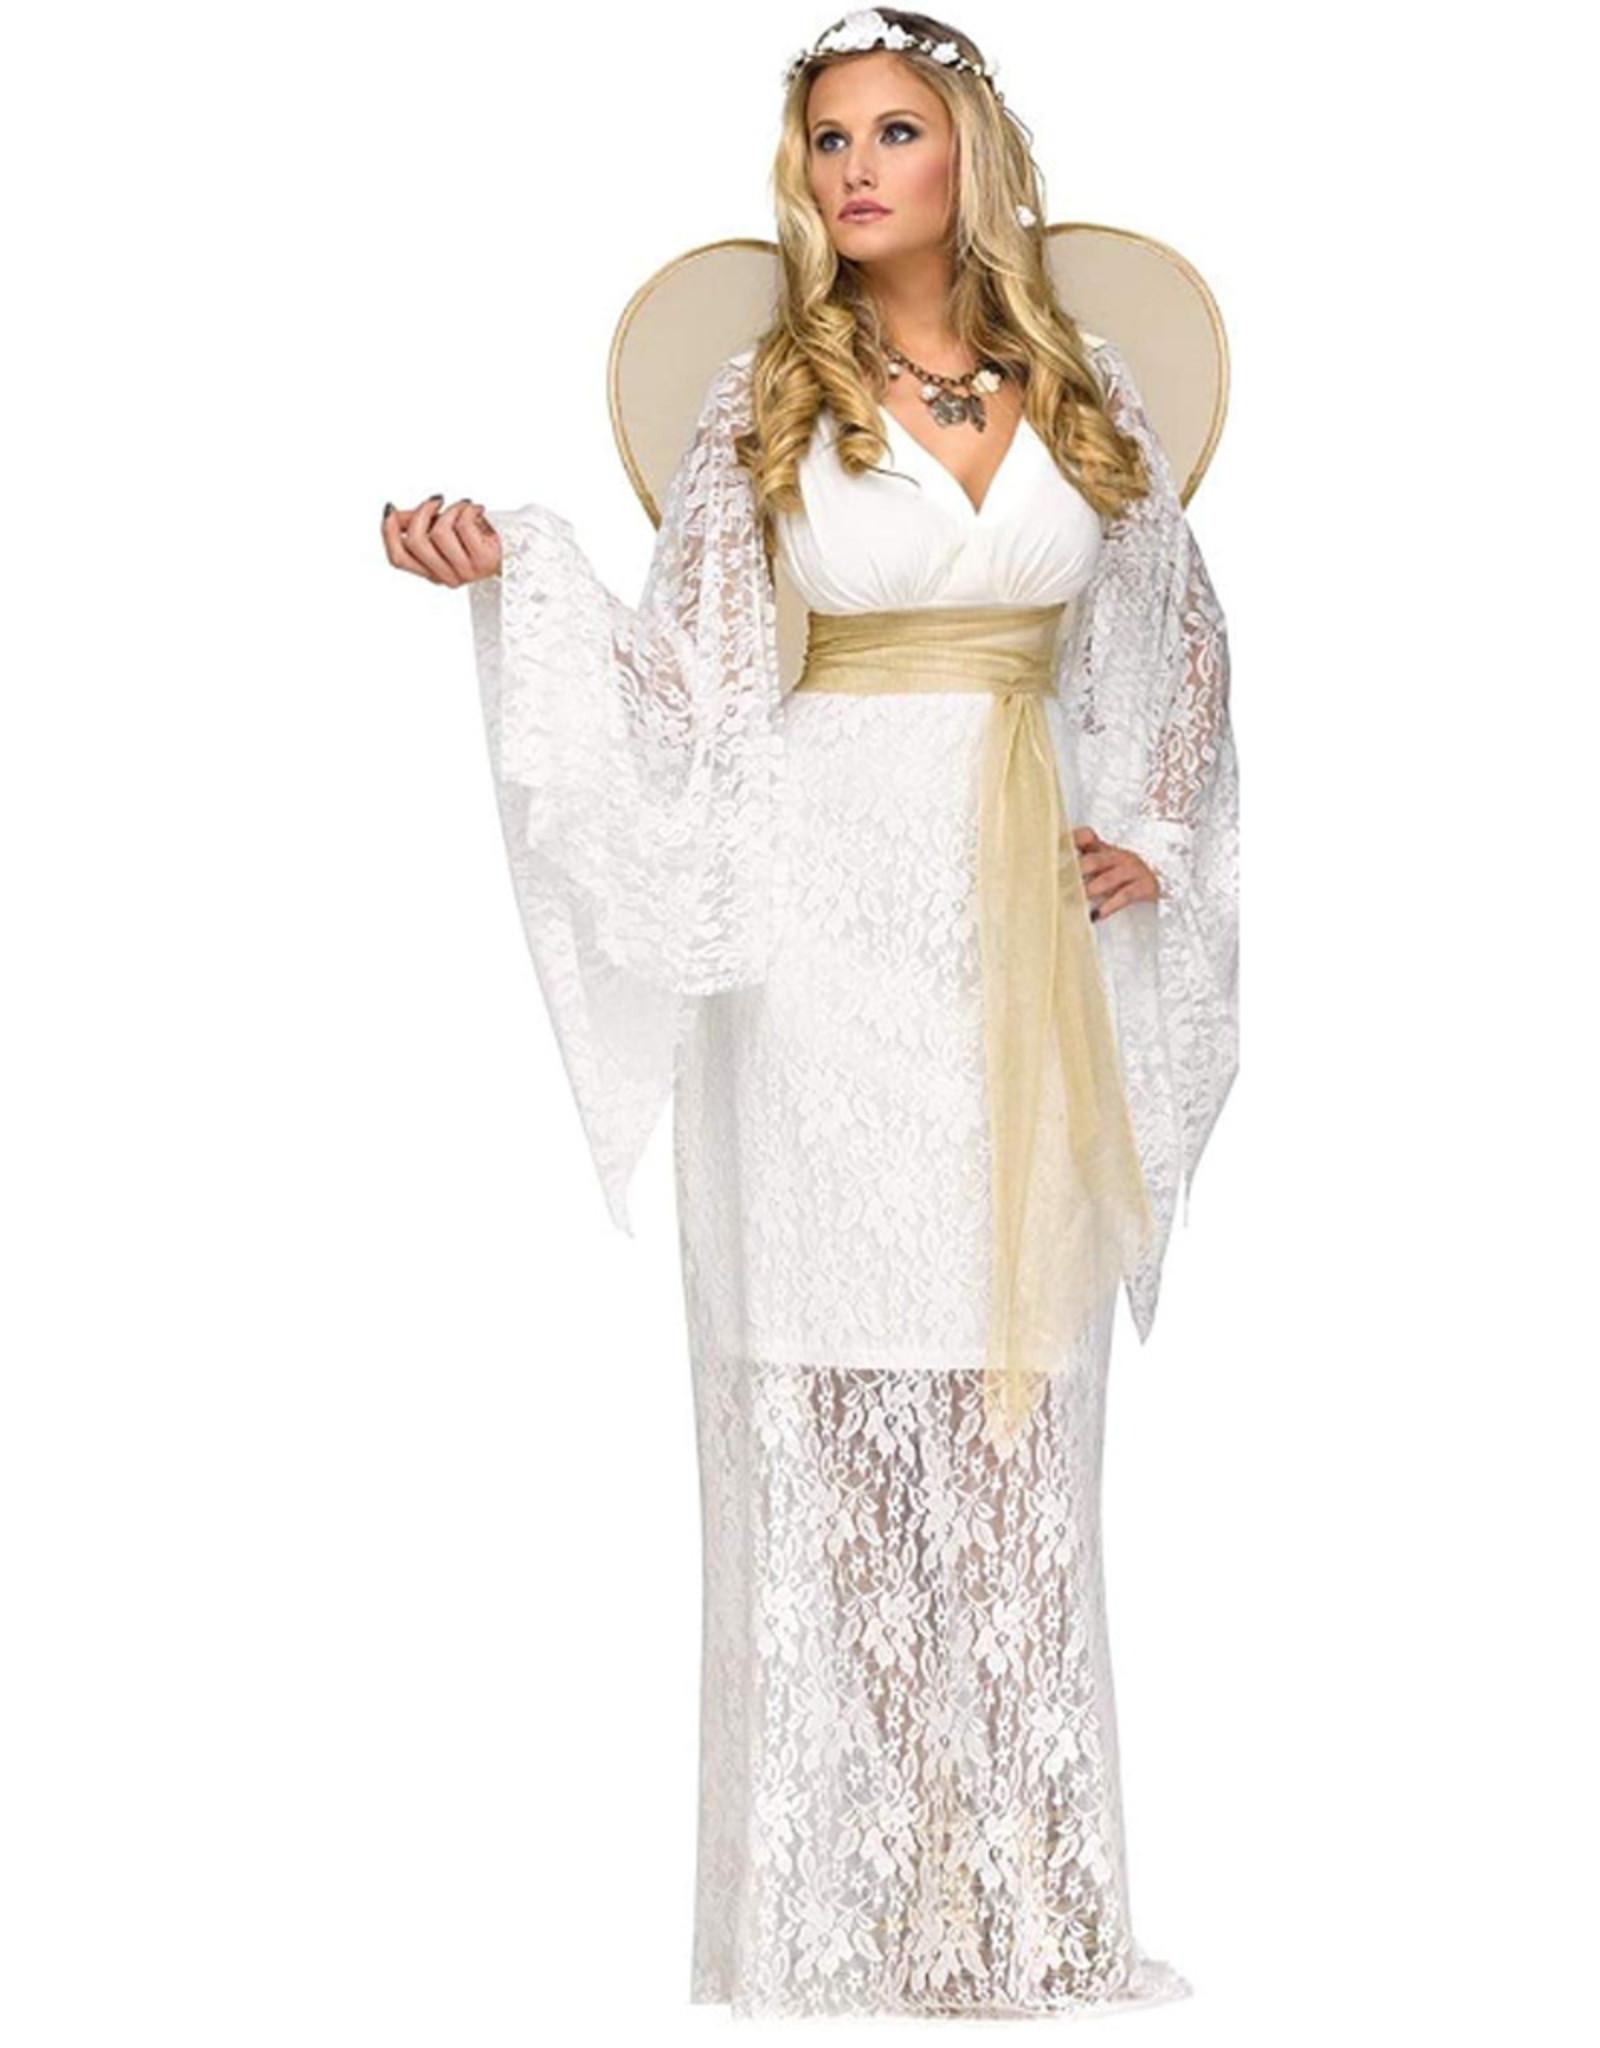 Angelic Maiden - Adult